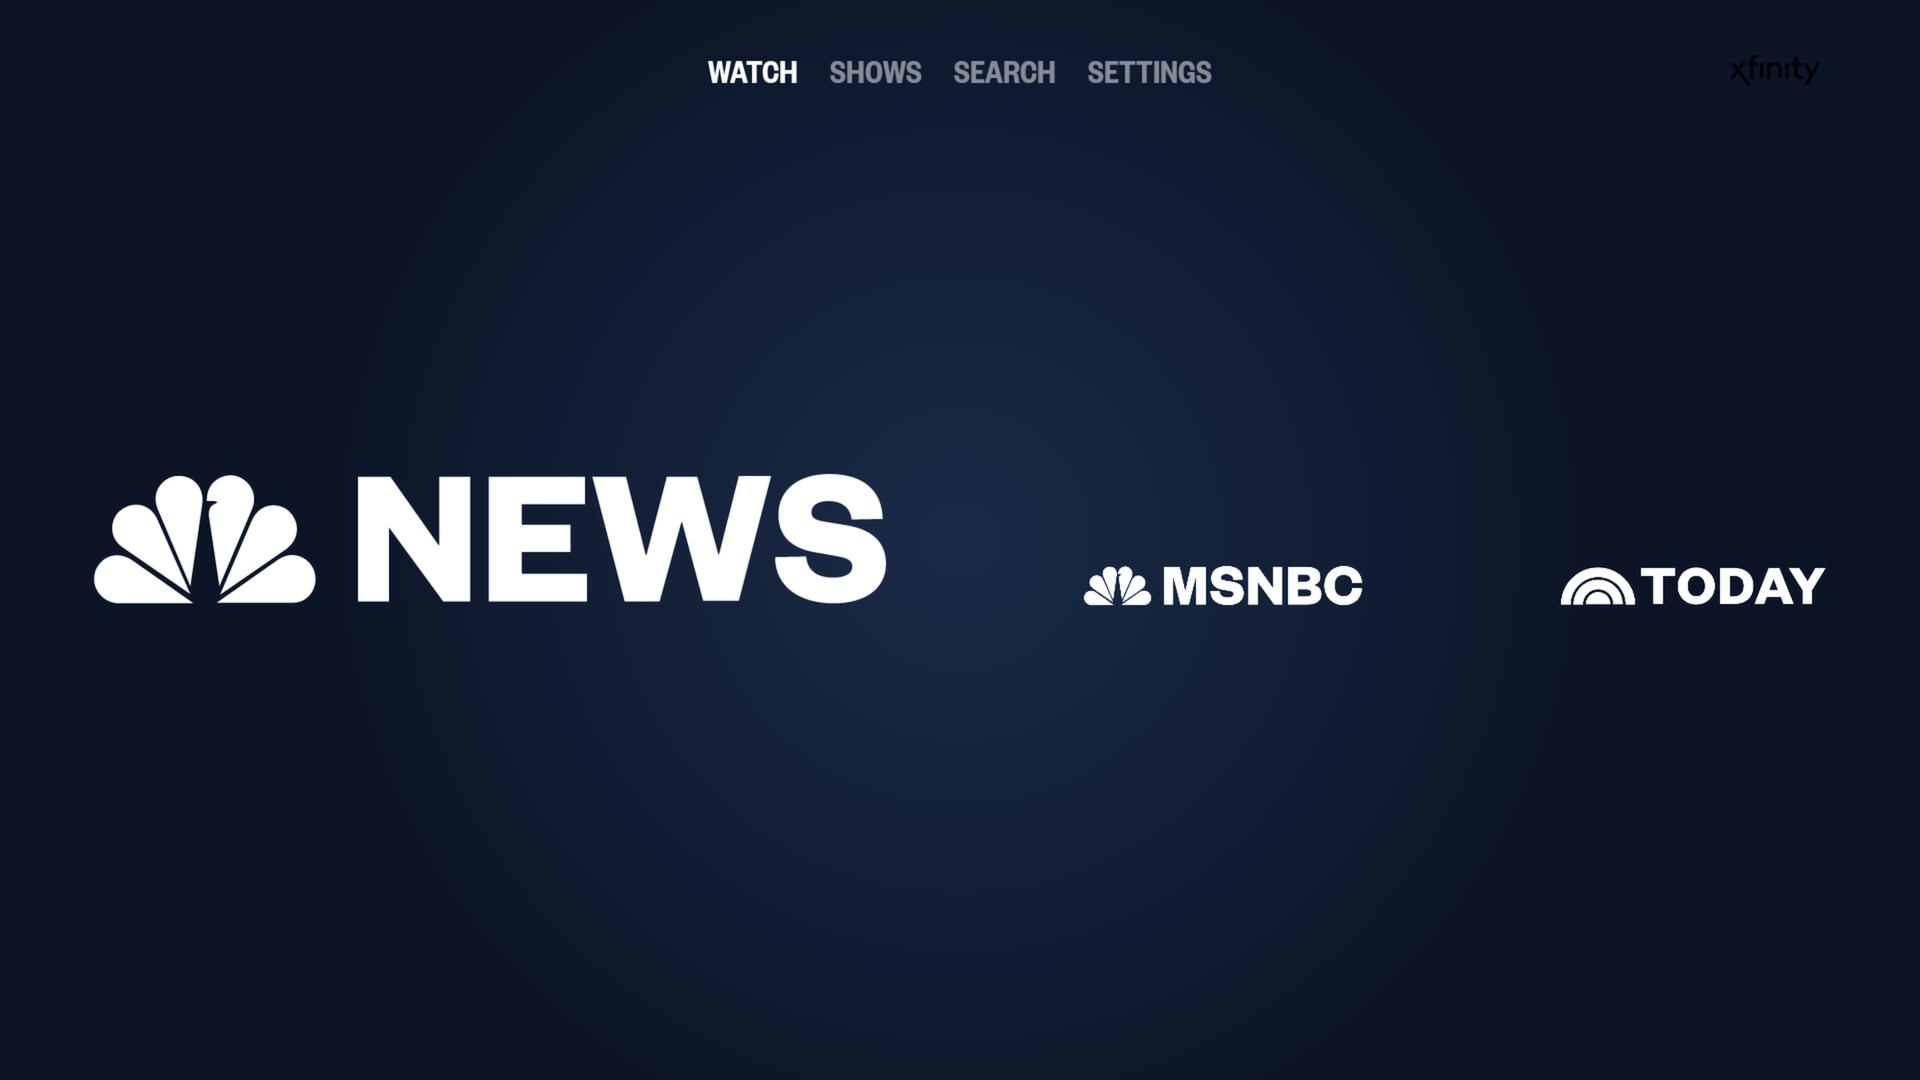 Verified safe dating msnbc live coverage